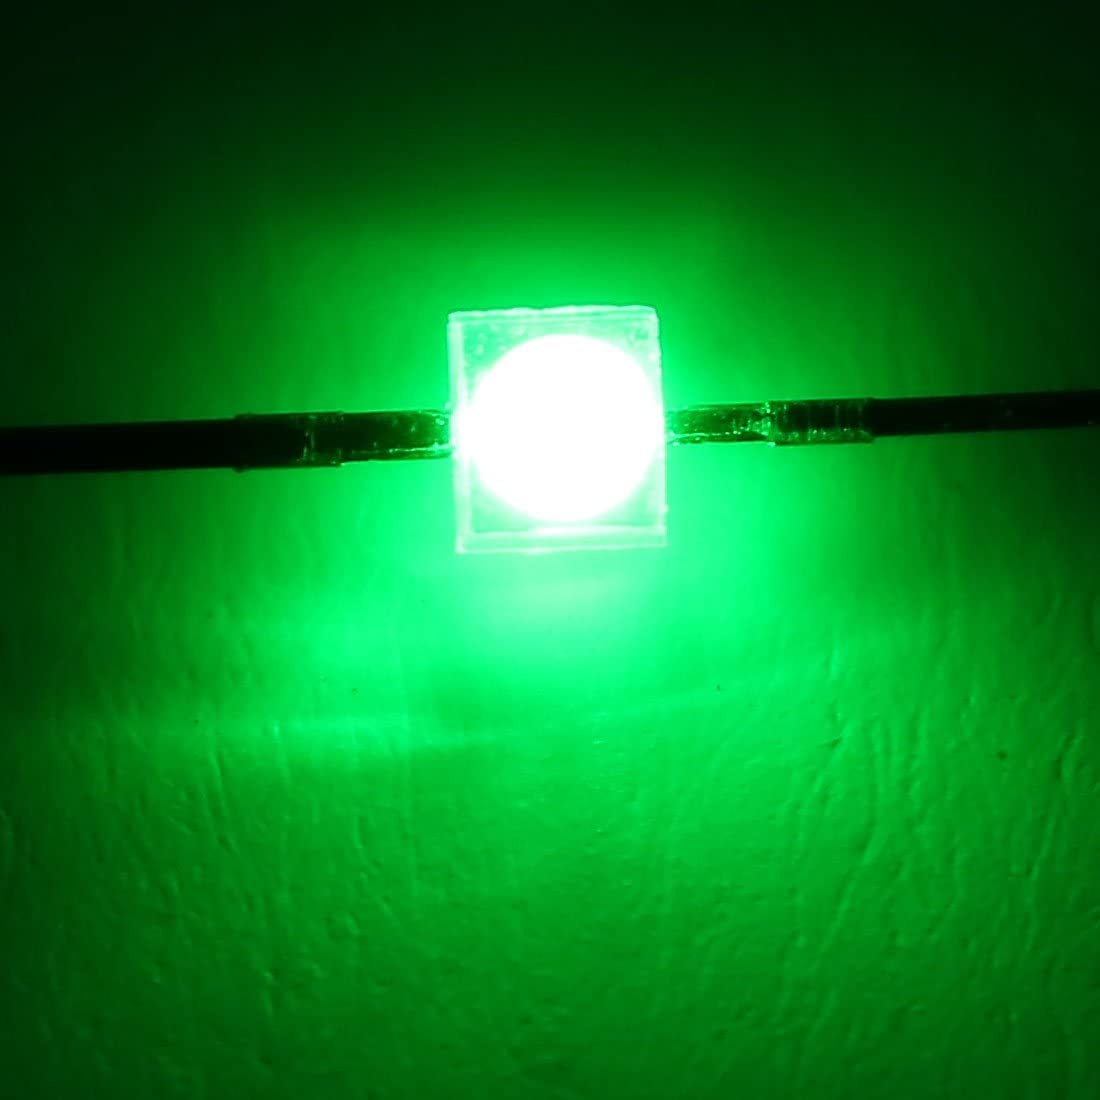 uxcell 20pcs 3V SMD Superbright LED Chip Lamp Light Emitting Diodes Green